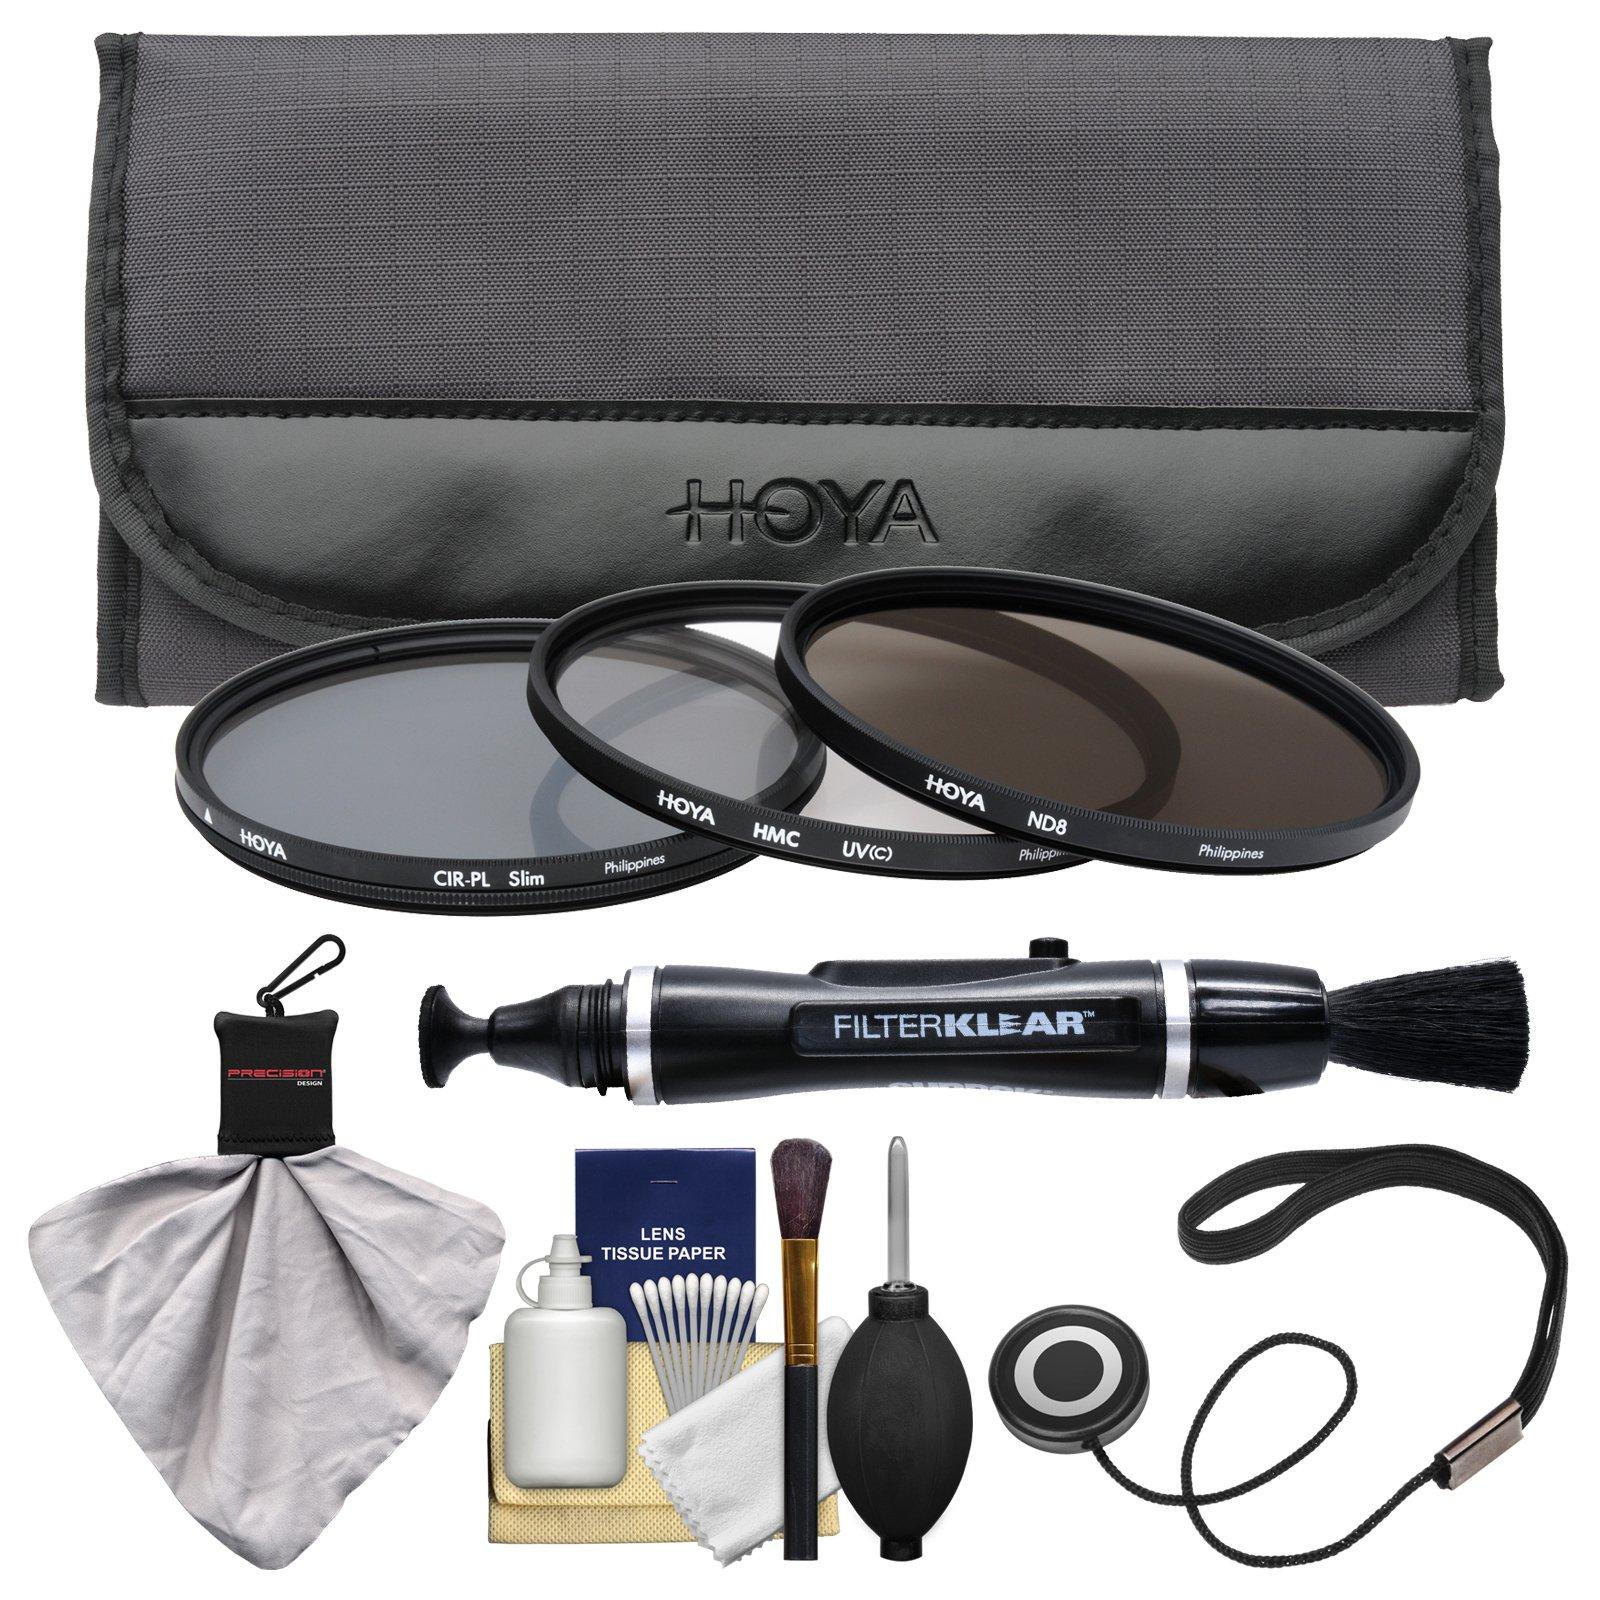 Hoya 52mm 3-Piece Digital Filter Set (HMC UV Ultraviolet, Circular Polarizer & ND8 Neutral Density) with Case + Cleaning Kit for Canon, Nikon, Sony, Olympus & Pentax Lenses